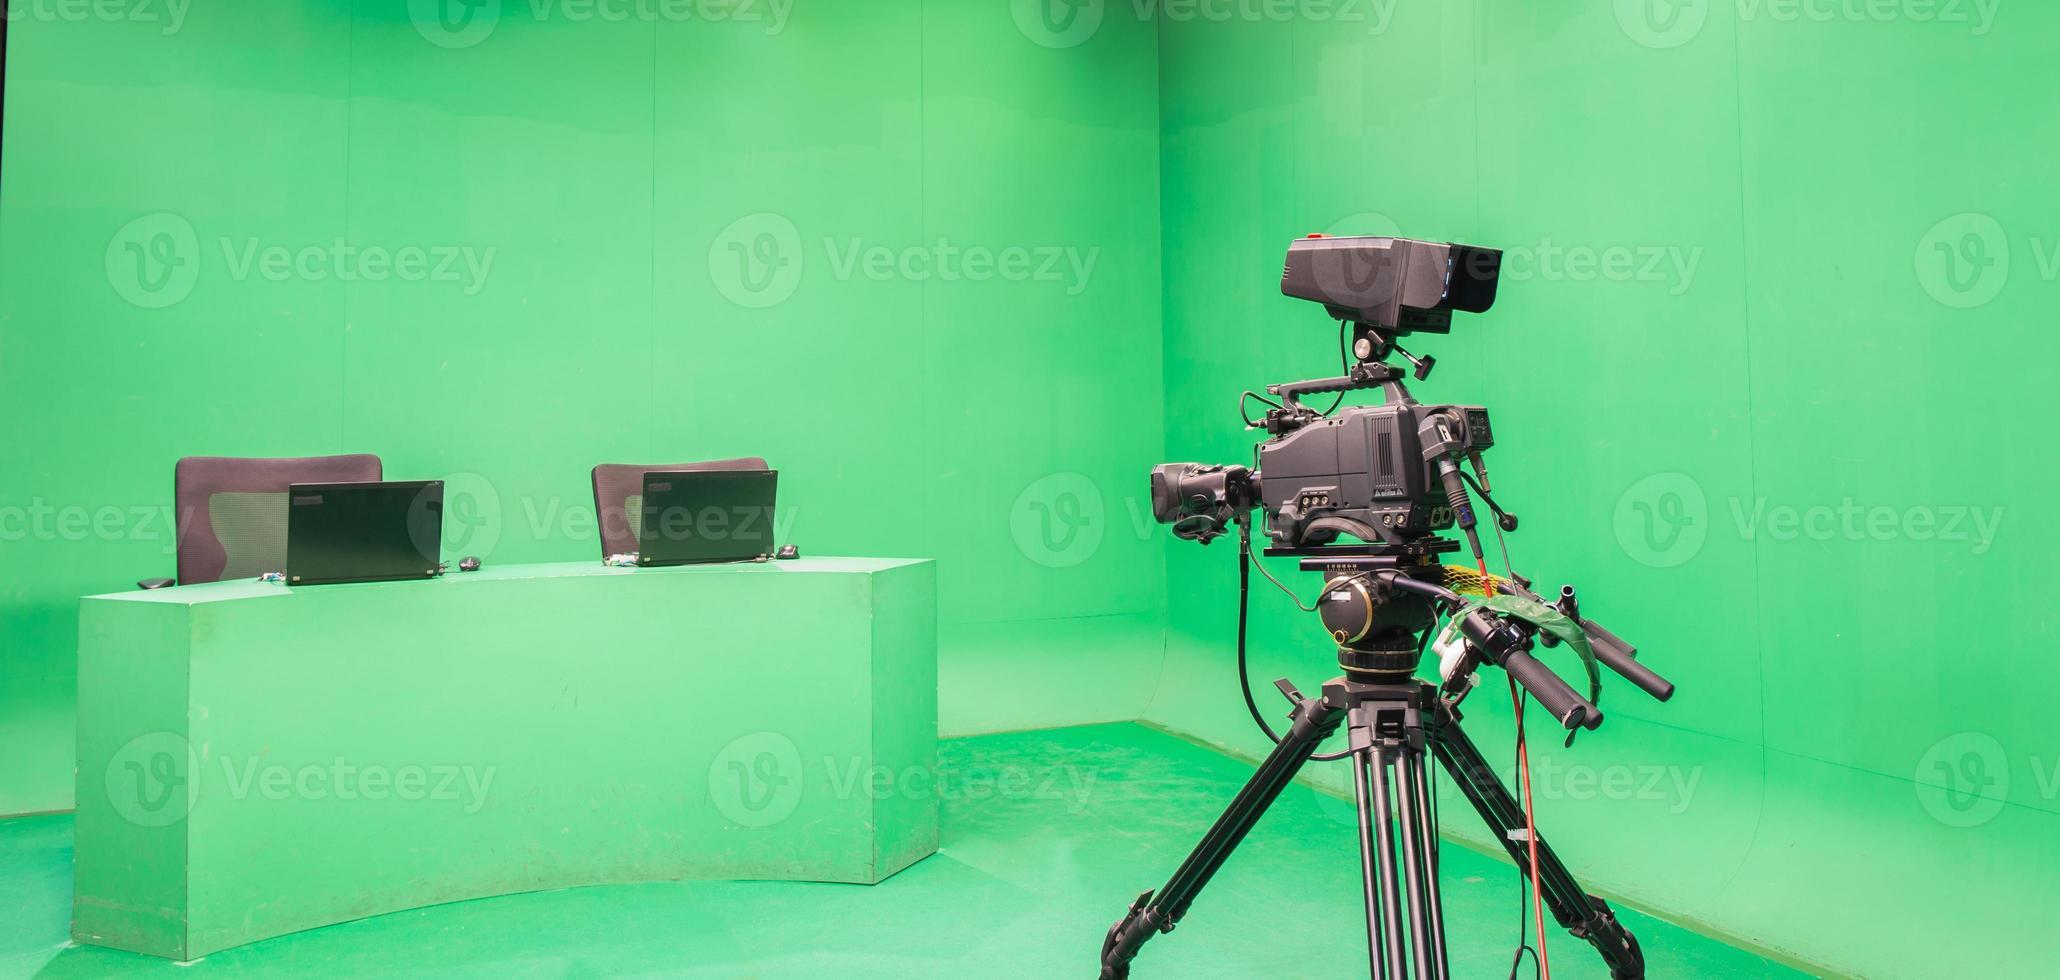 Fernsehstudio foto